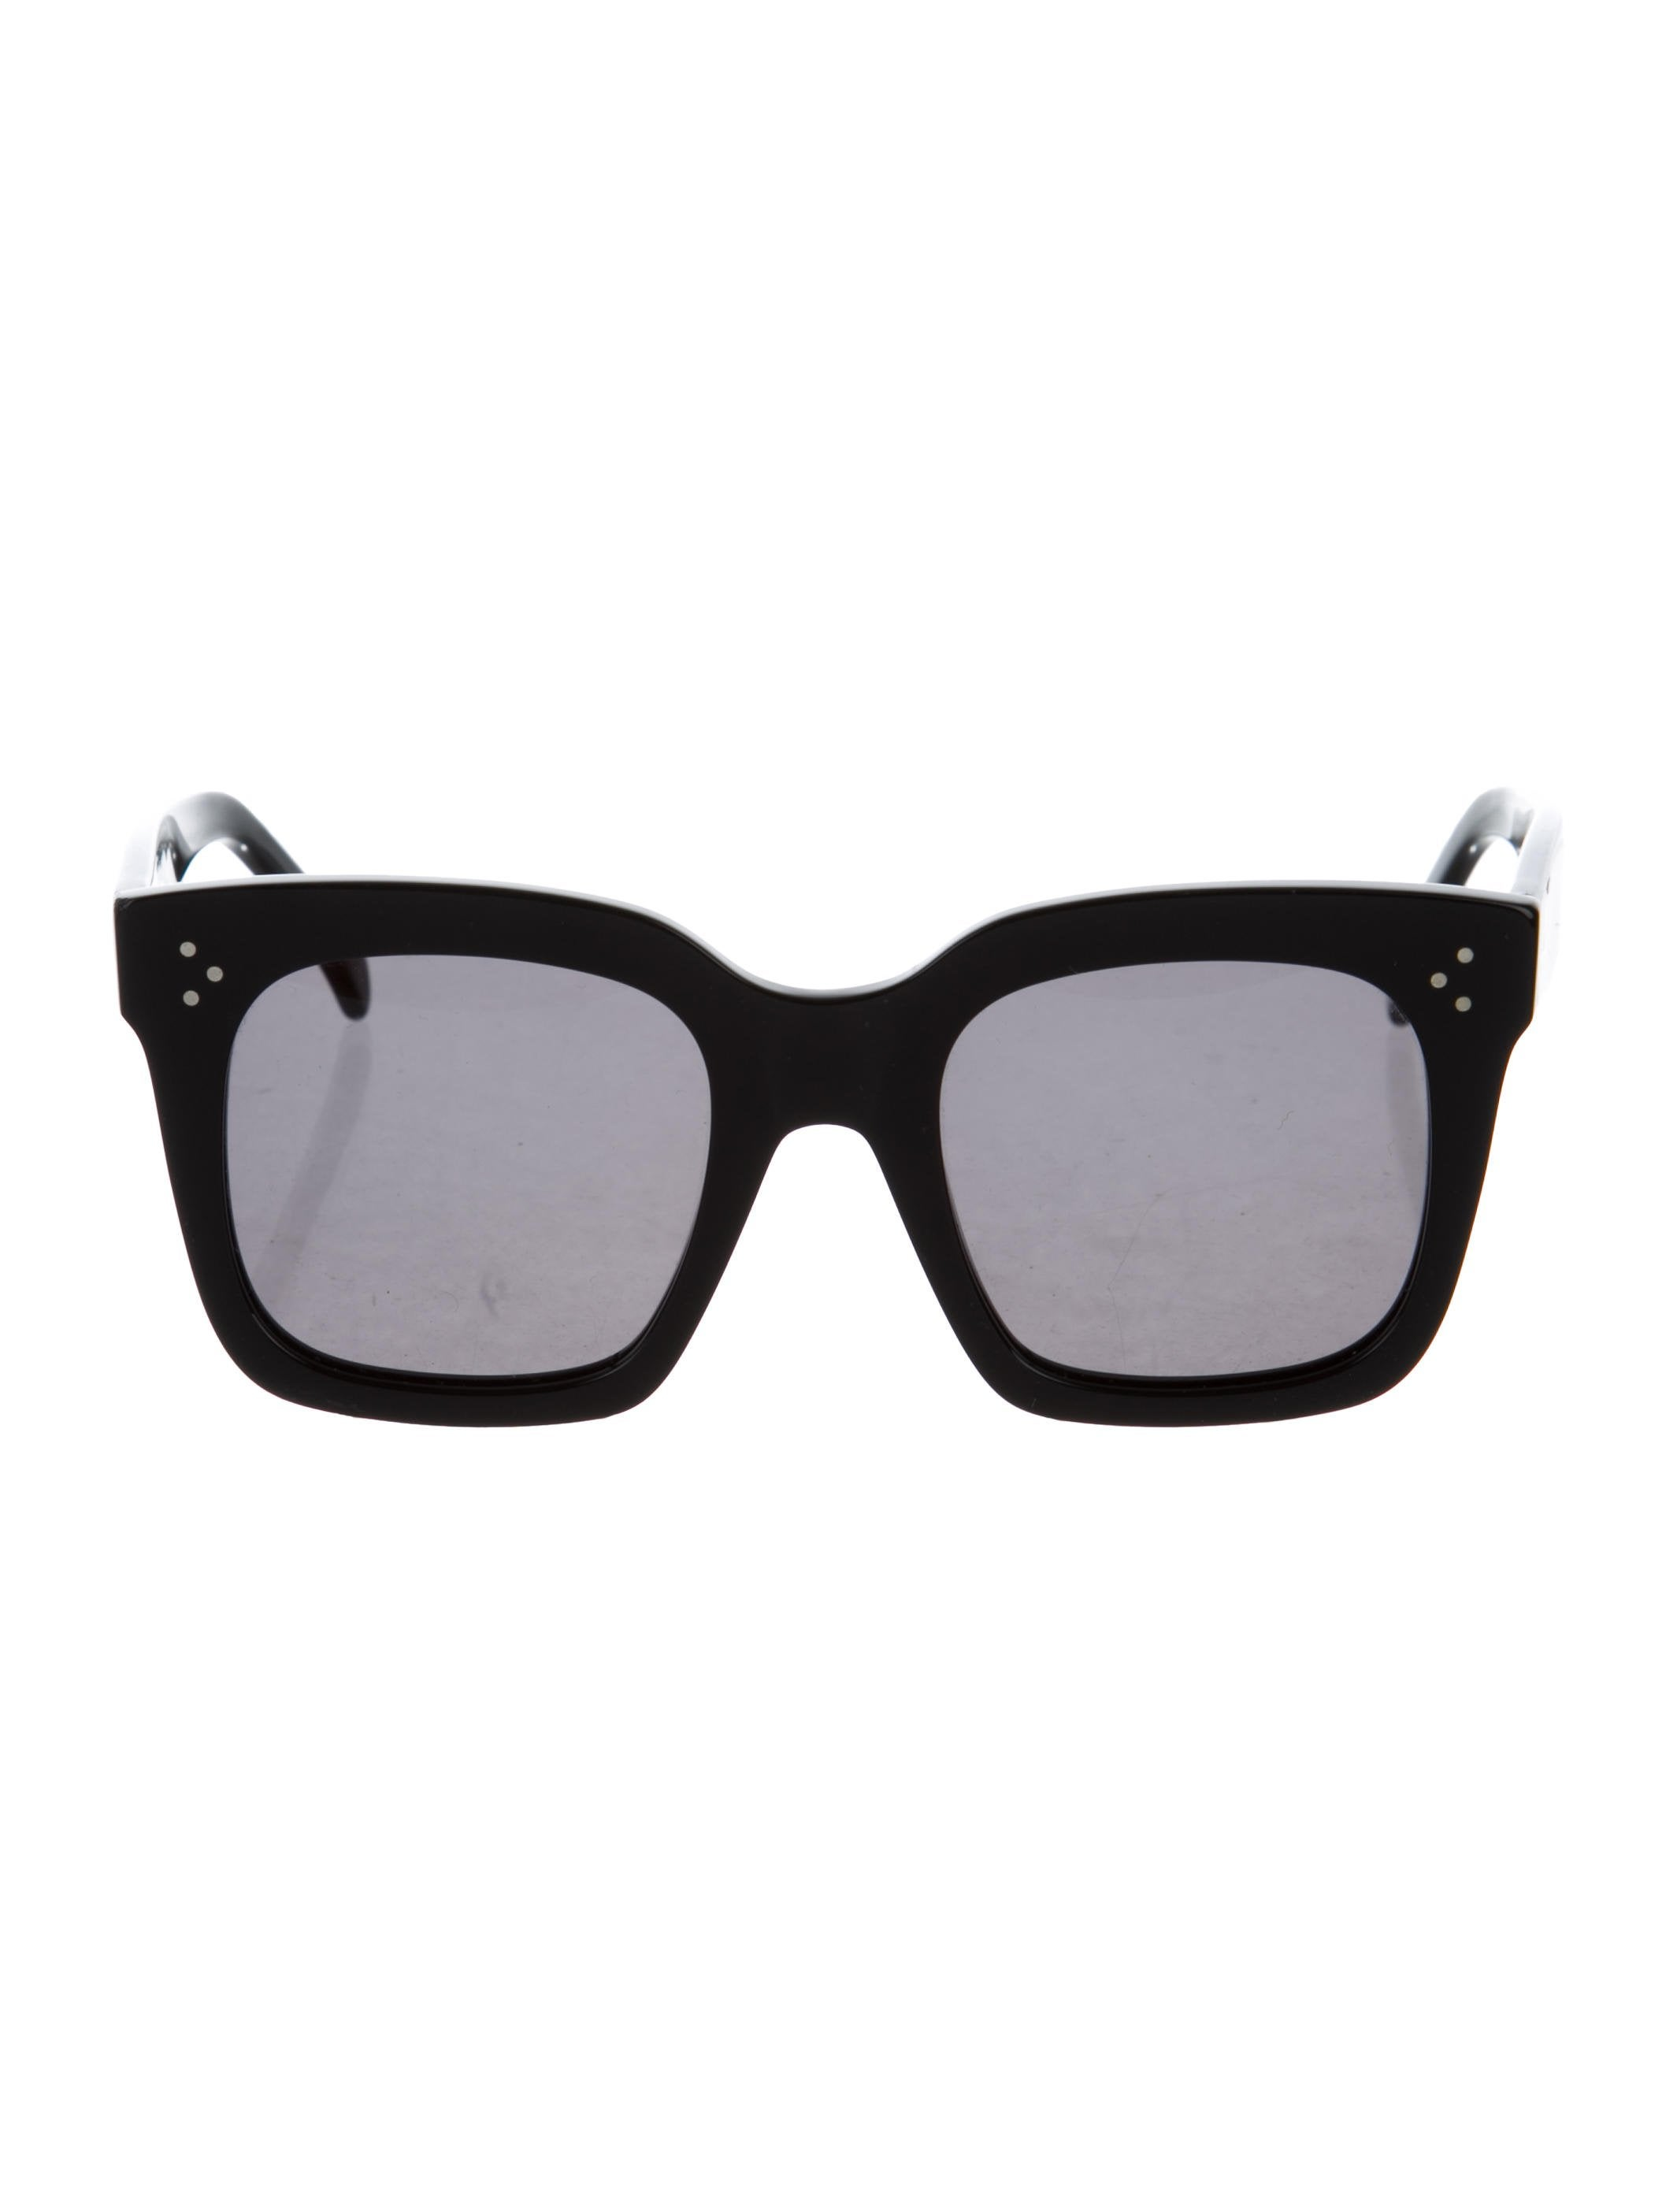 8d37f0bcbc72 Celine Céline Tilda Oversize Sunglasses - Accessories - CEL77063 ...